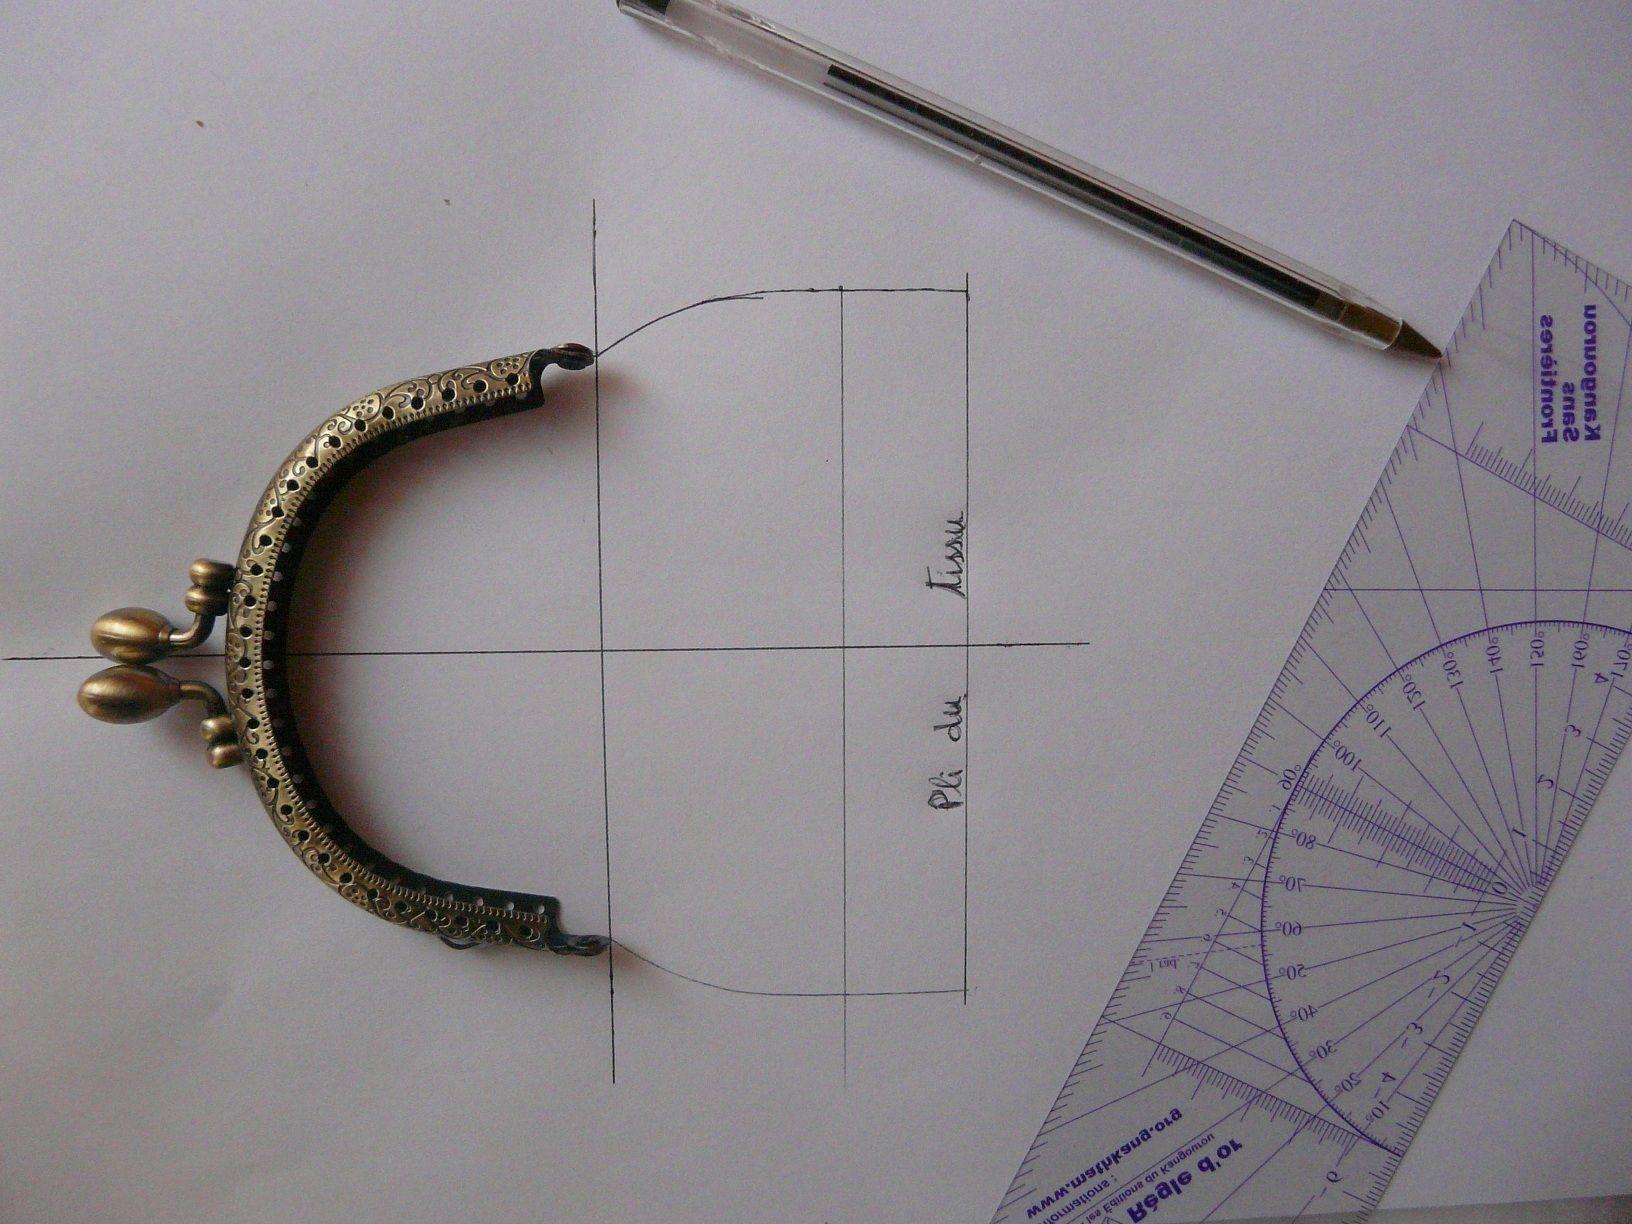 tuto porte monnaie sewing pinterest tuto porte. Black Bedroom Furniture Sets. Home Design Ideas